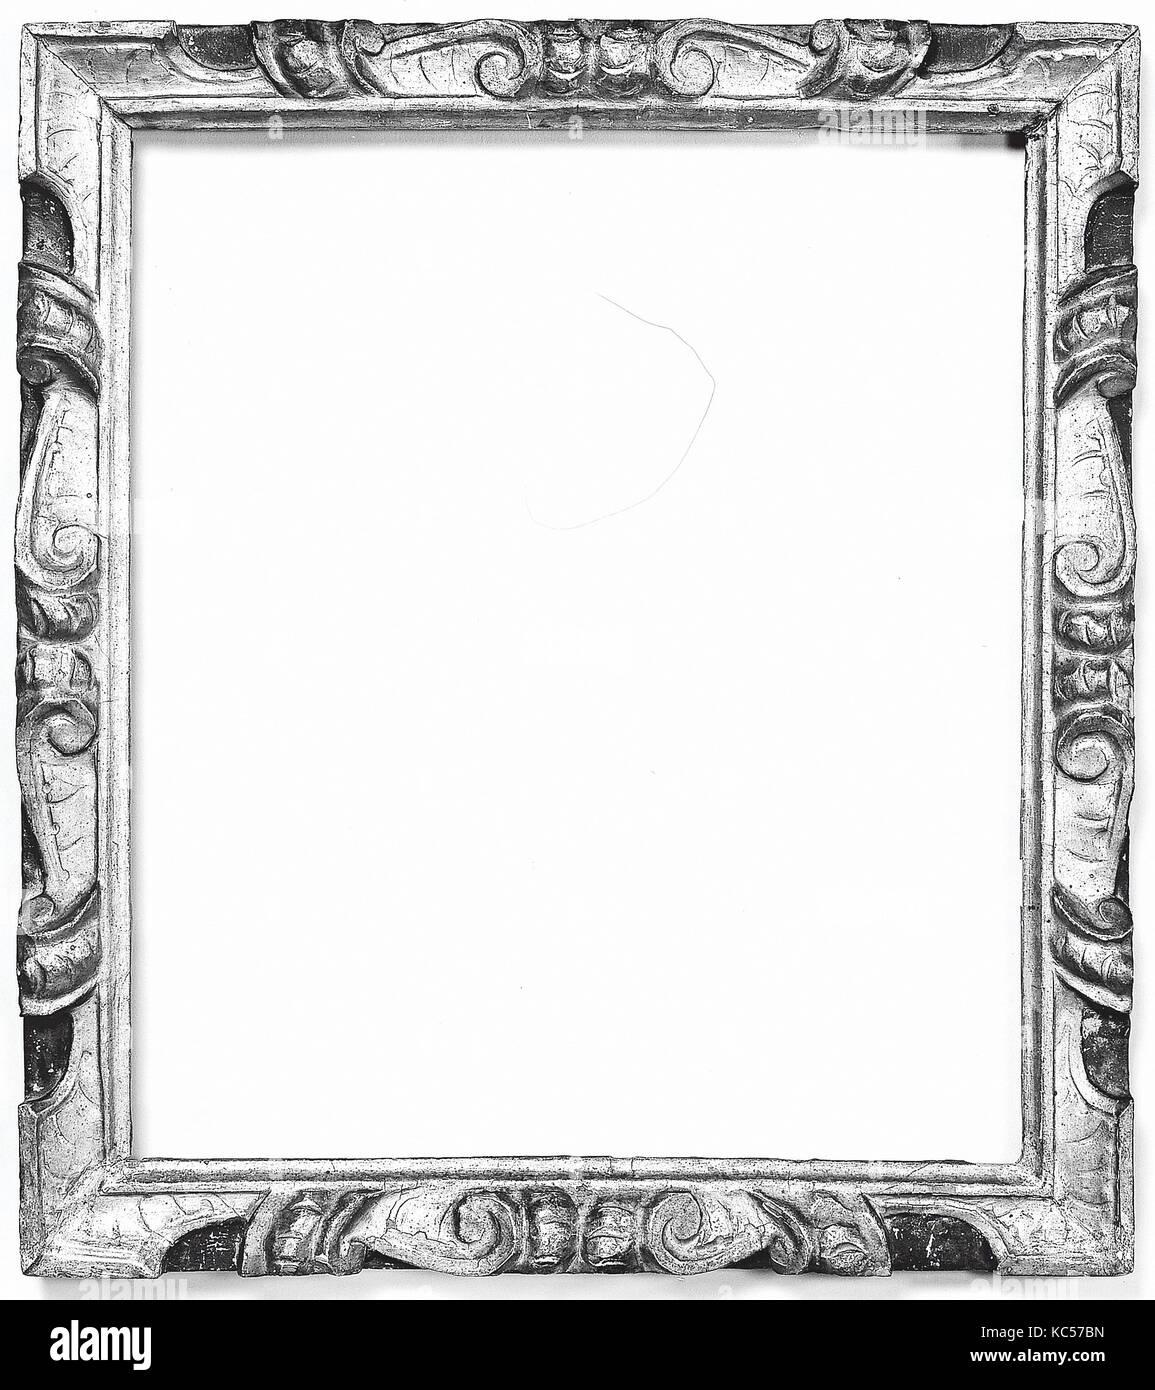 Sansovino frame, Ende 16. bis Anfang des 17. Jahrhunderts ...